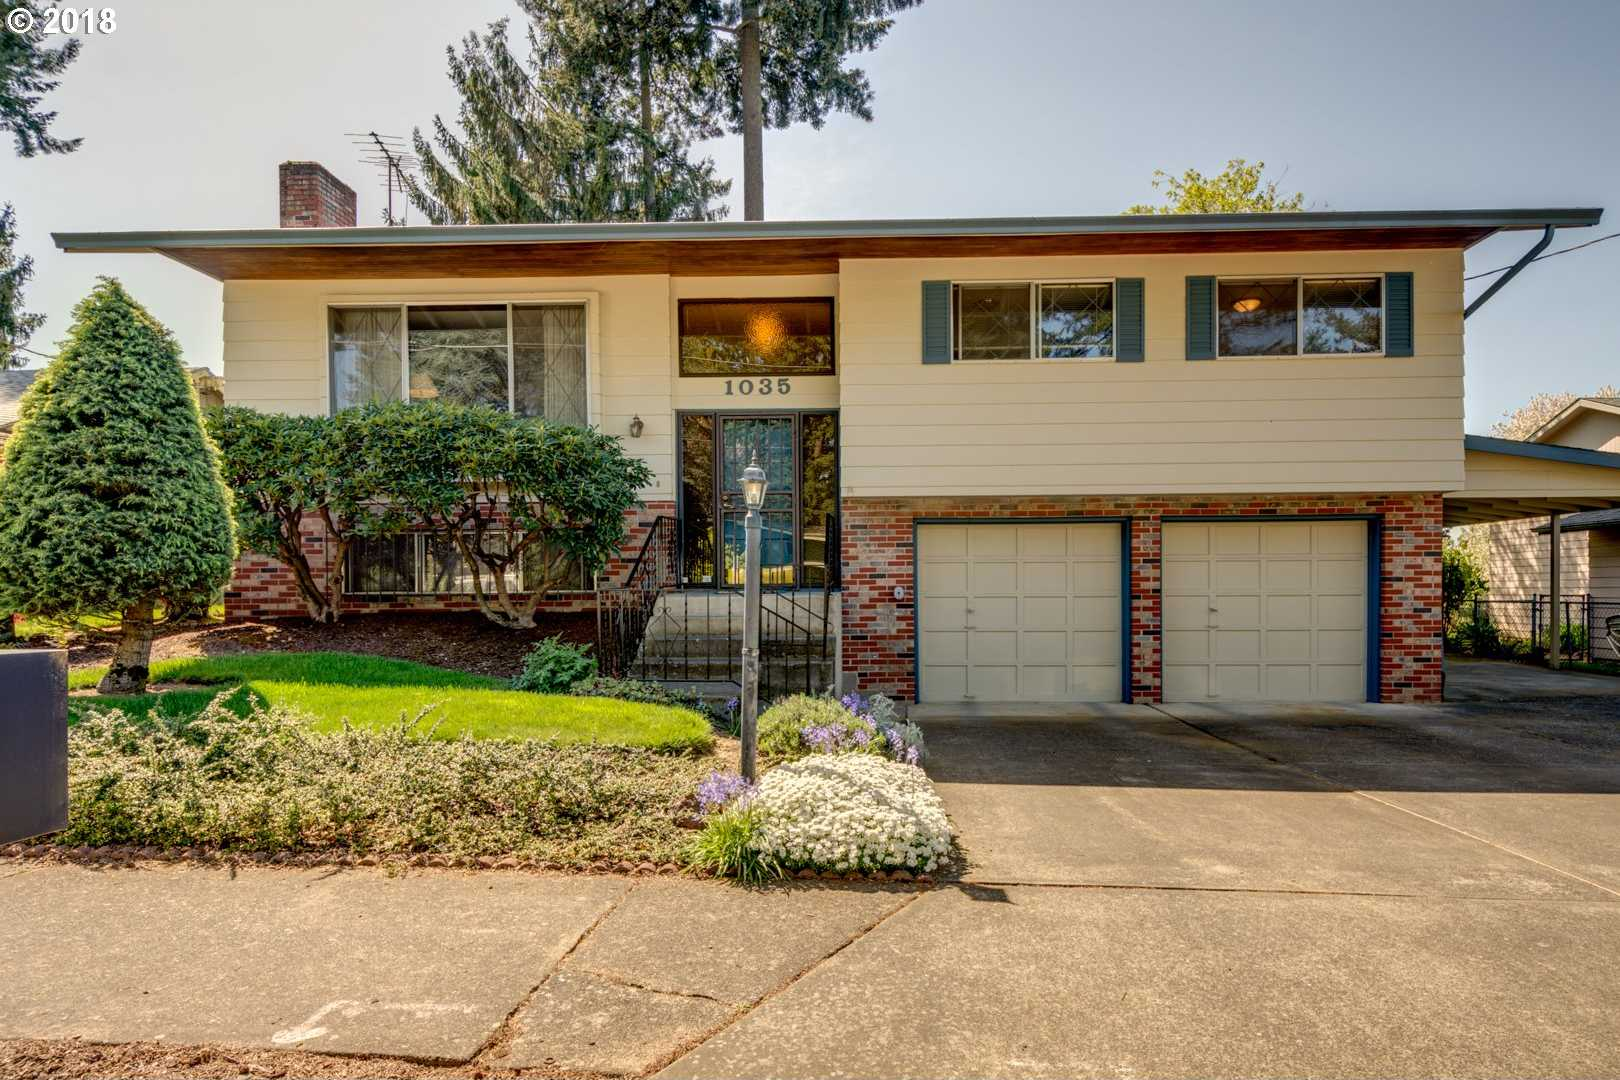 $350,000 - 4Br/3Ba -  for Sale in Wilkes East, Portland